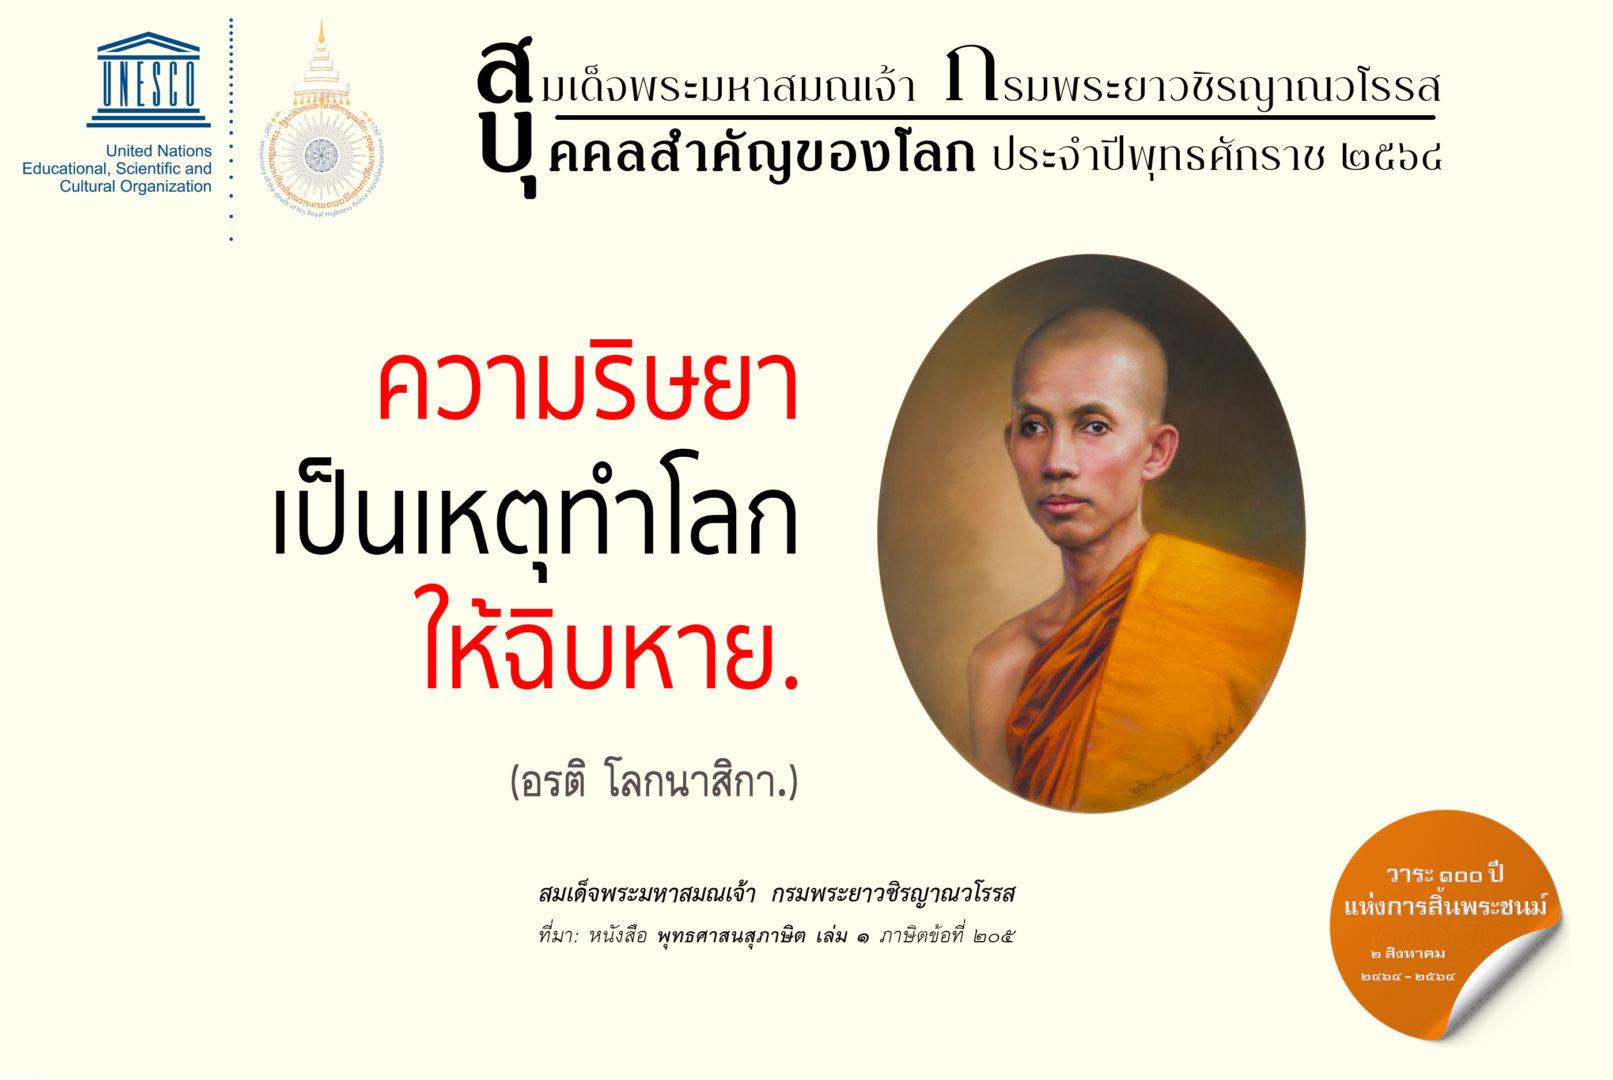 Th Mahasamana Quote 007